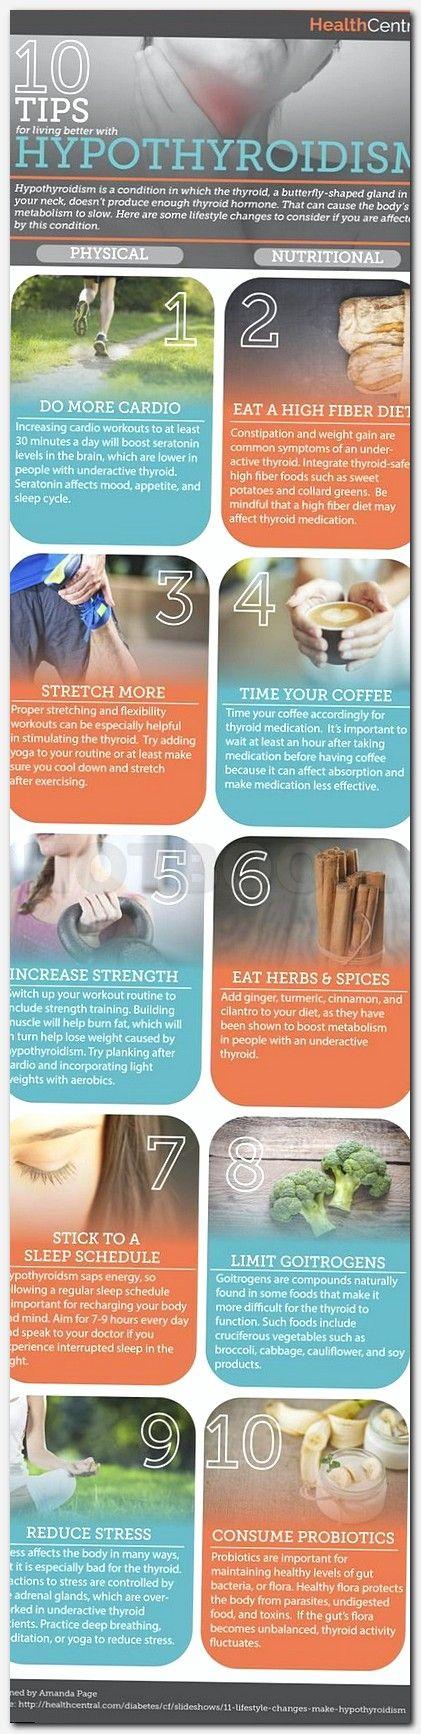 Create own weight loss program photo 29